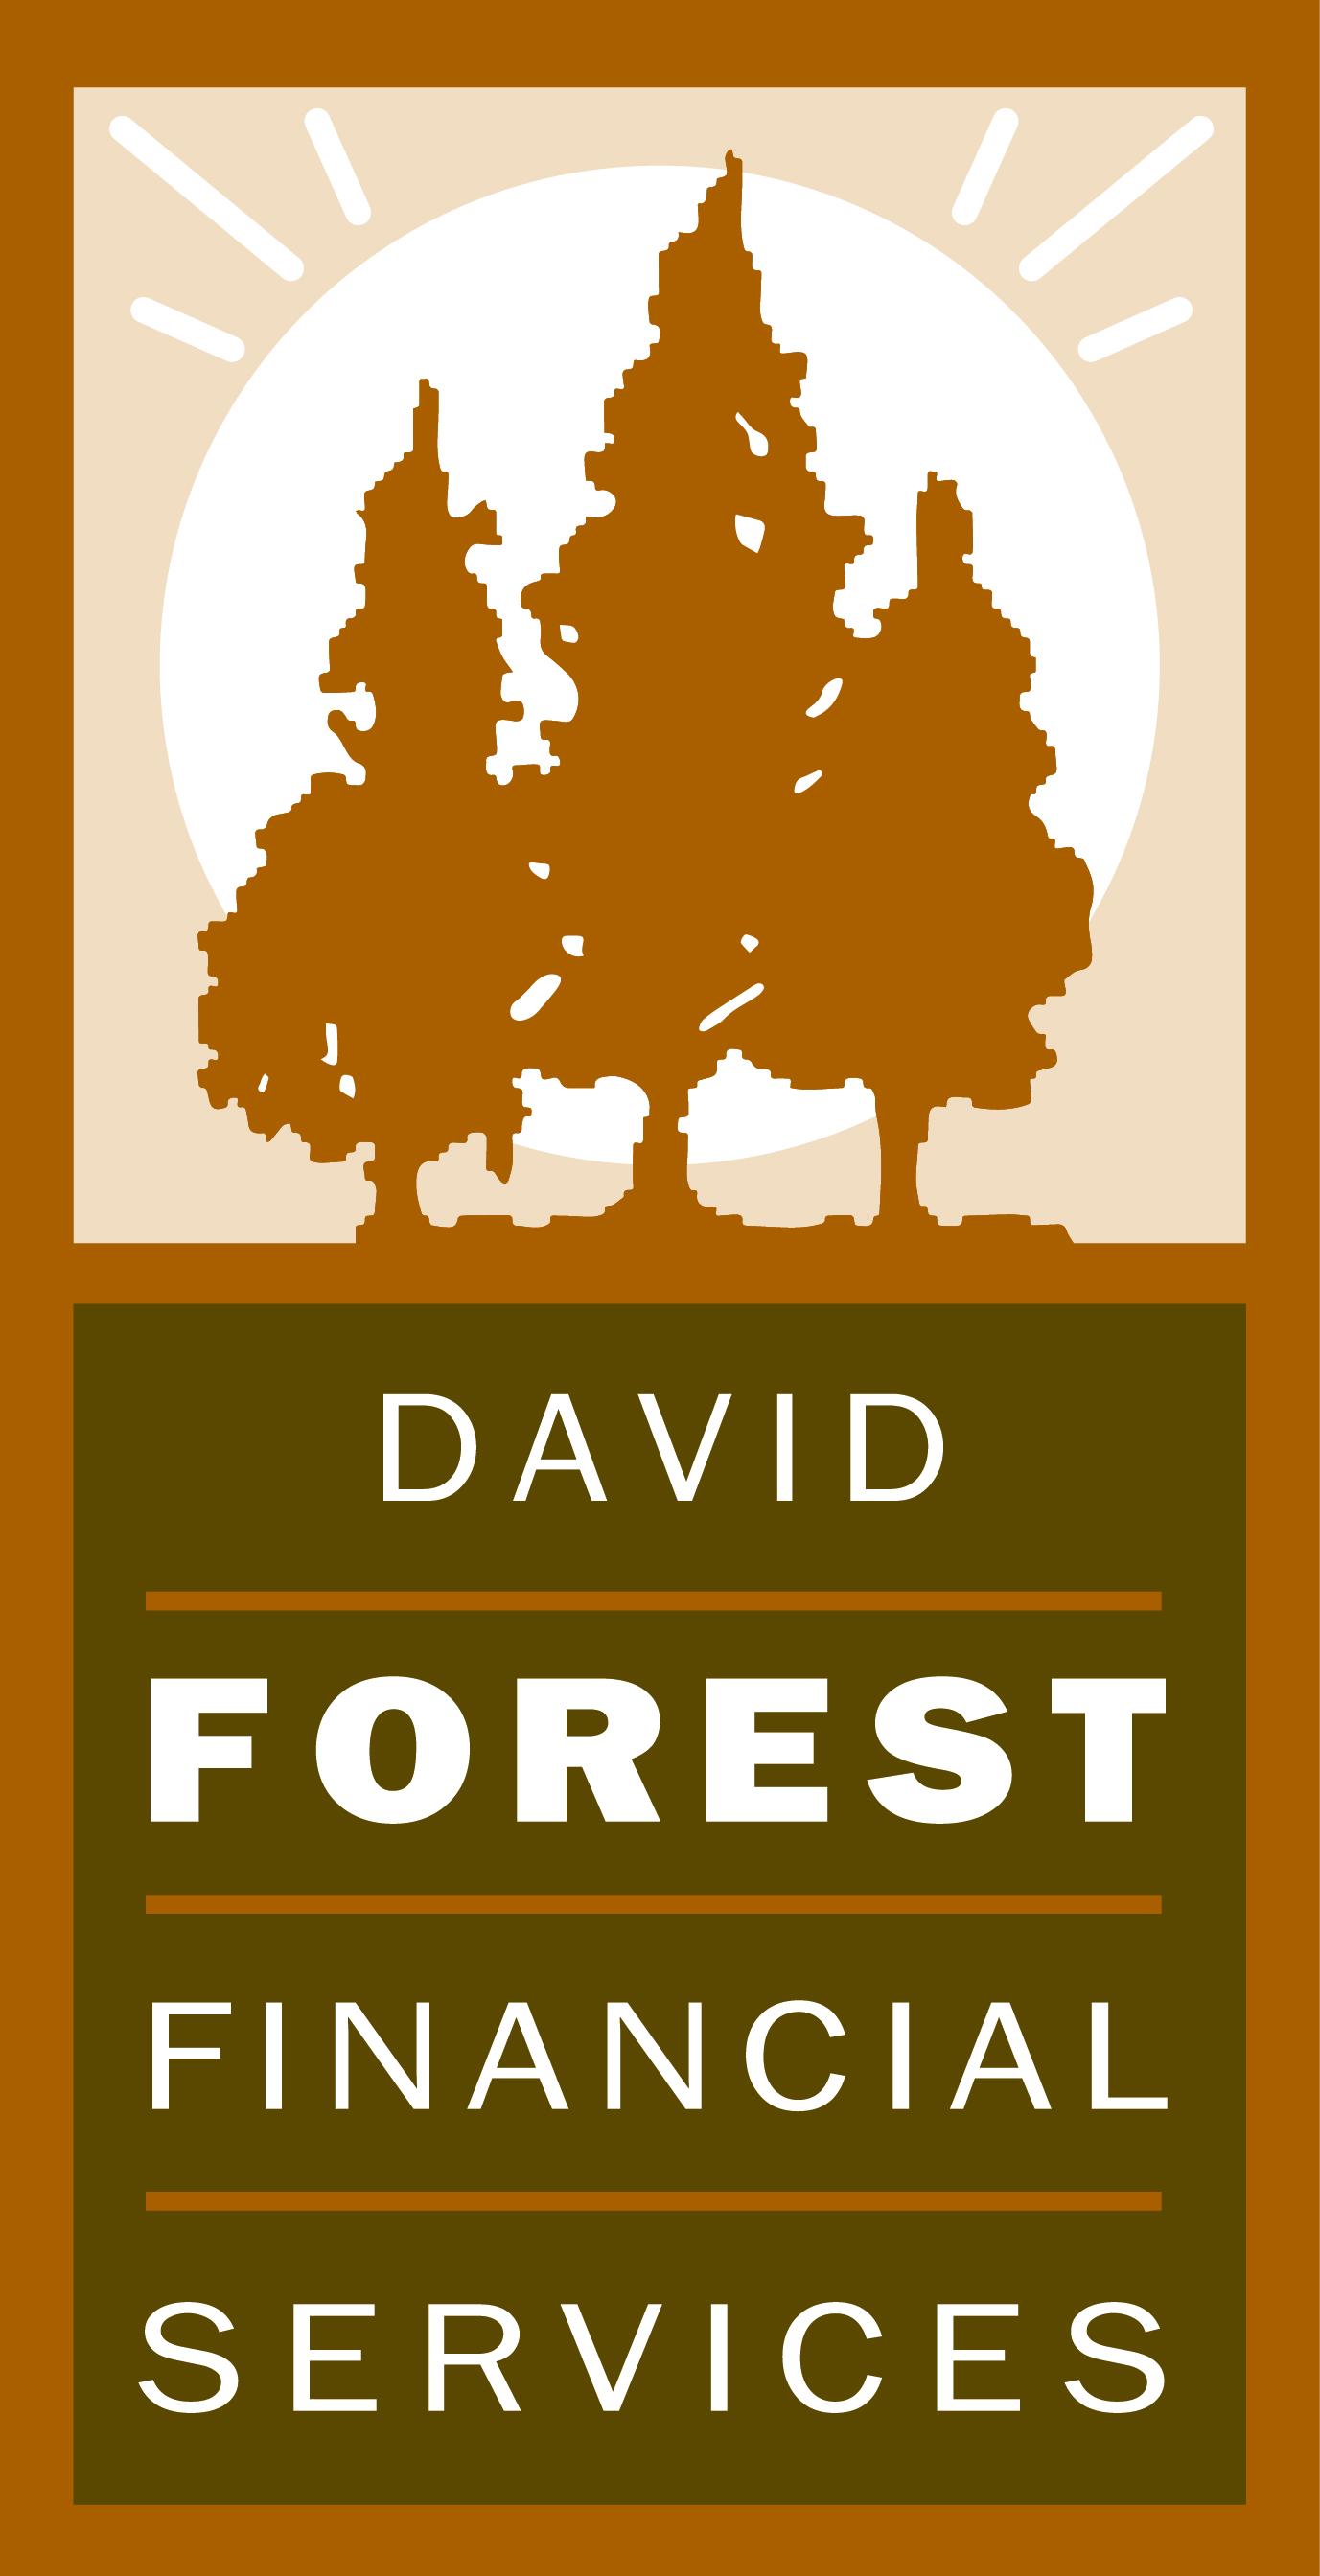 logo_David_Forest.jpg